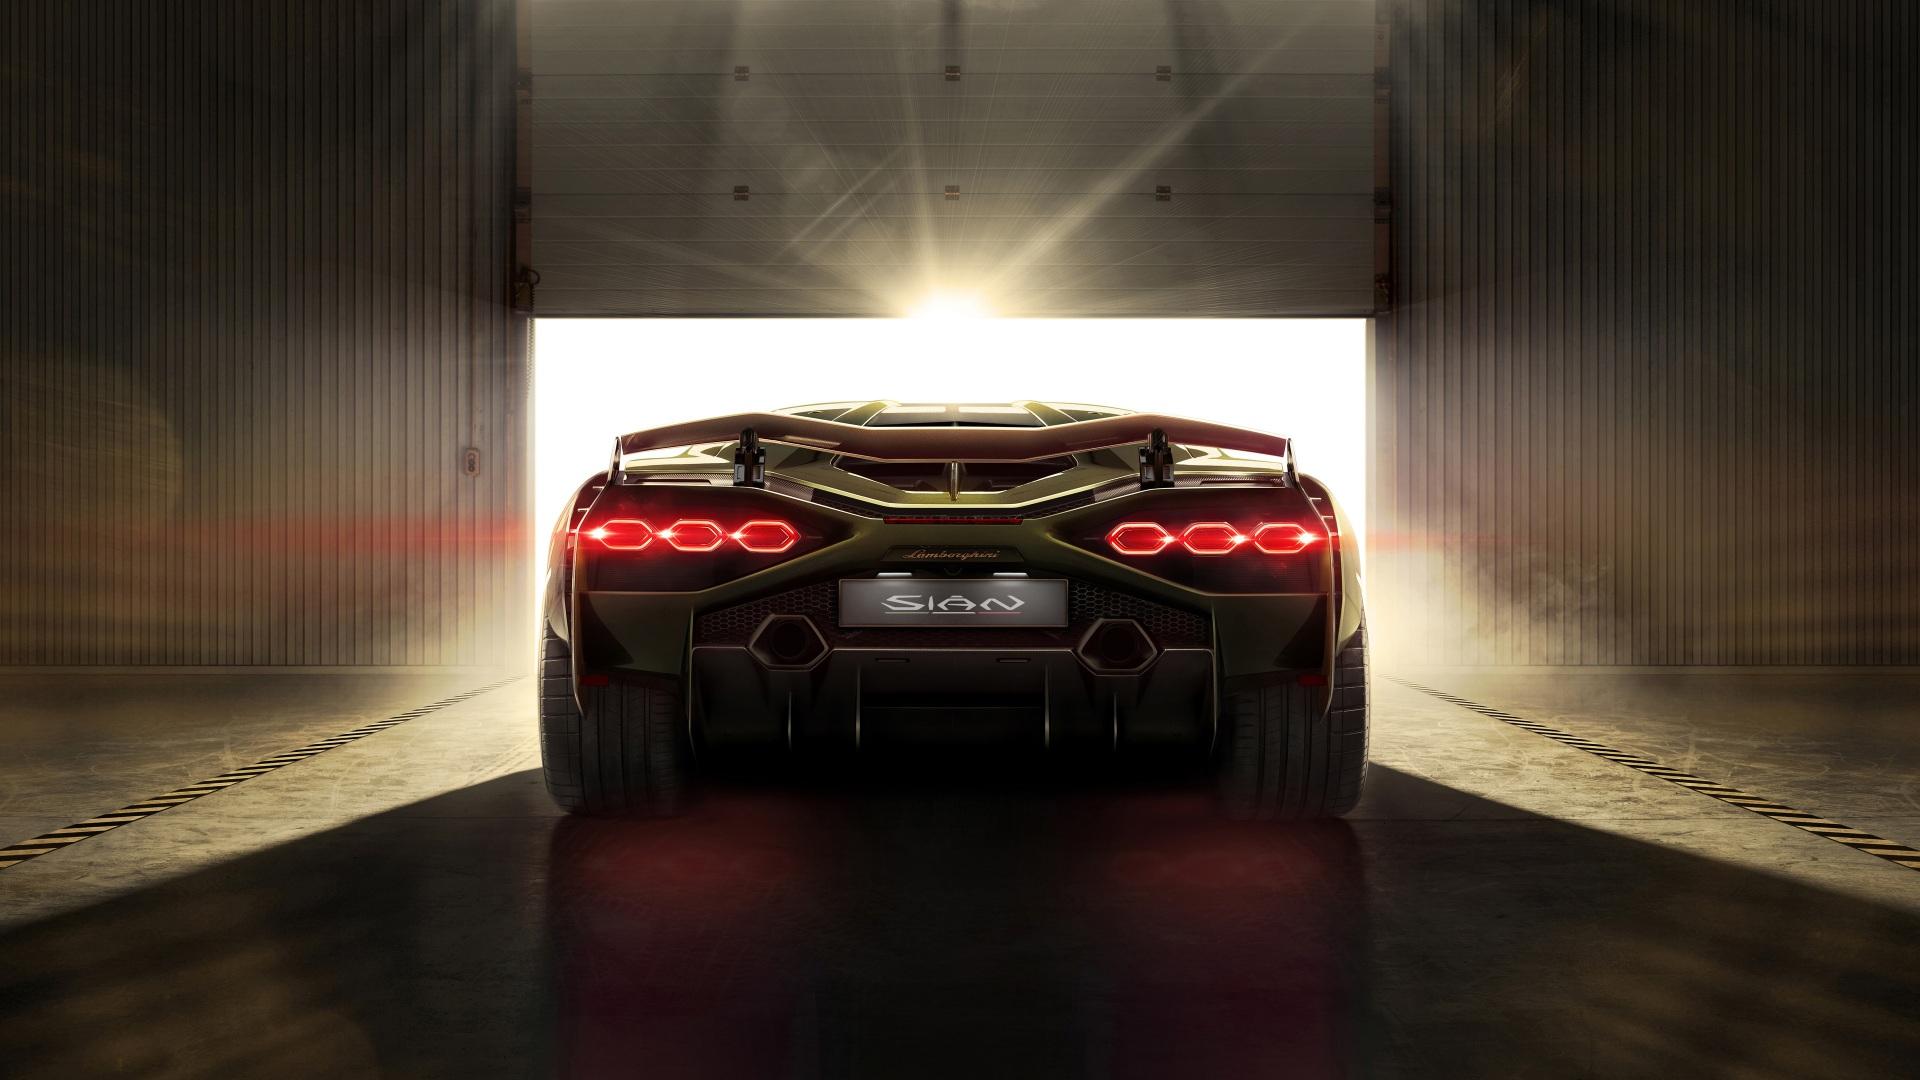 Sian Rear Tail lights